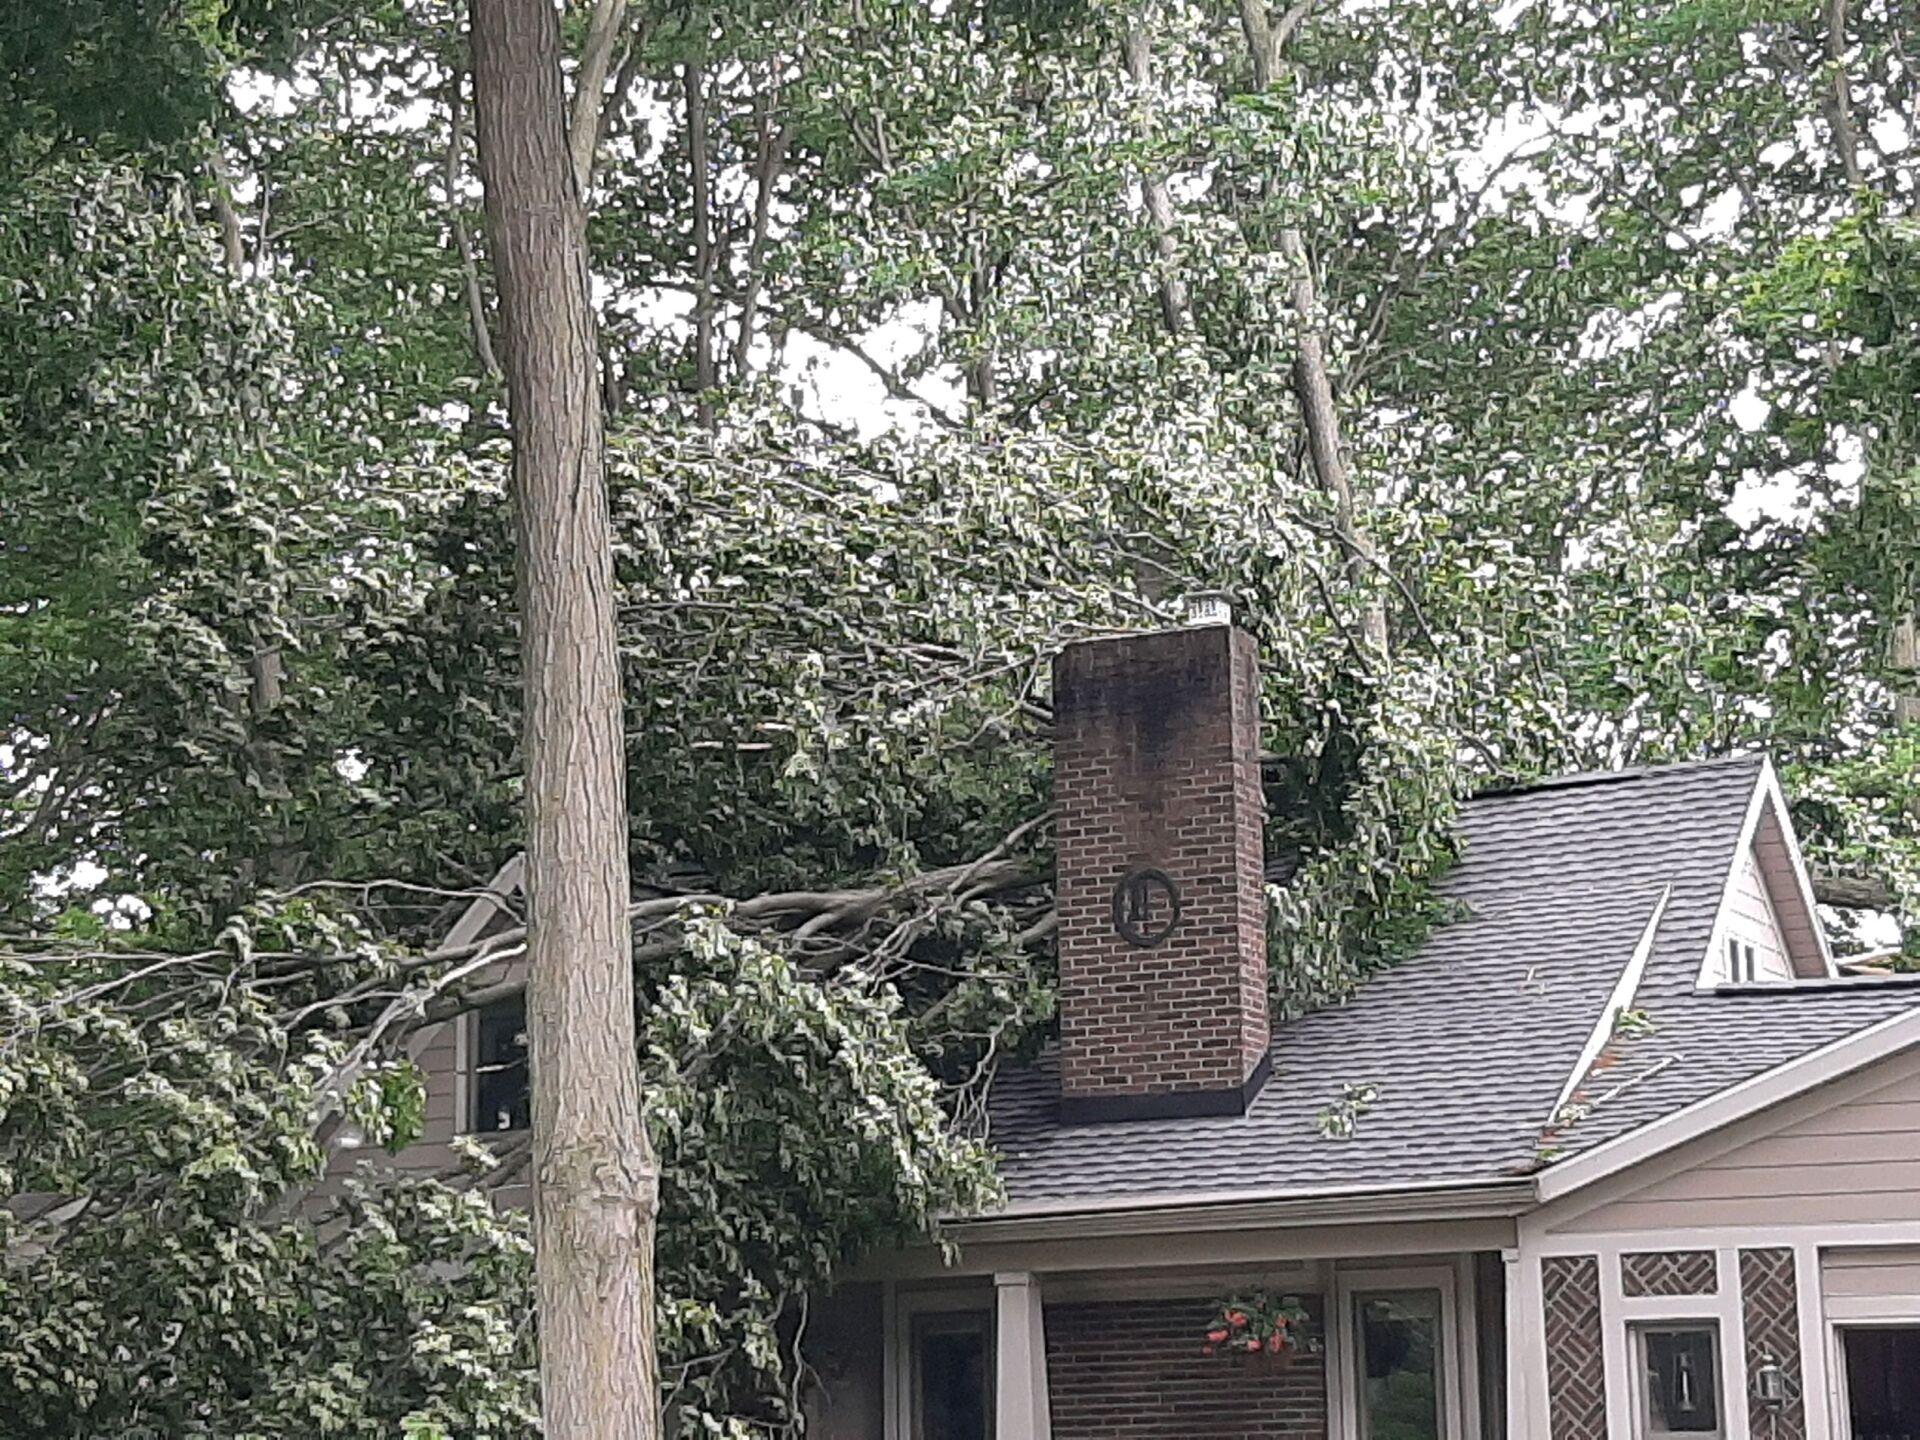 Gerogetown township storm damage 5.jpg